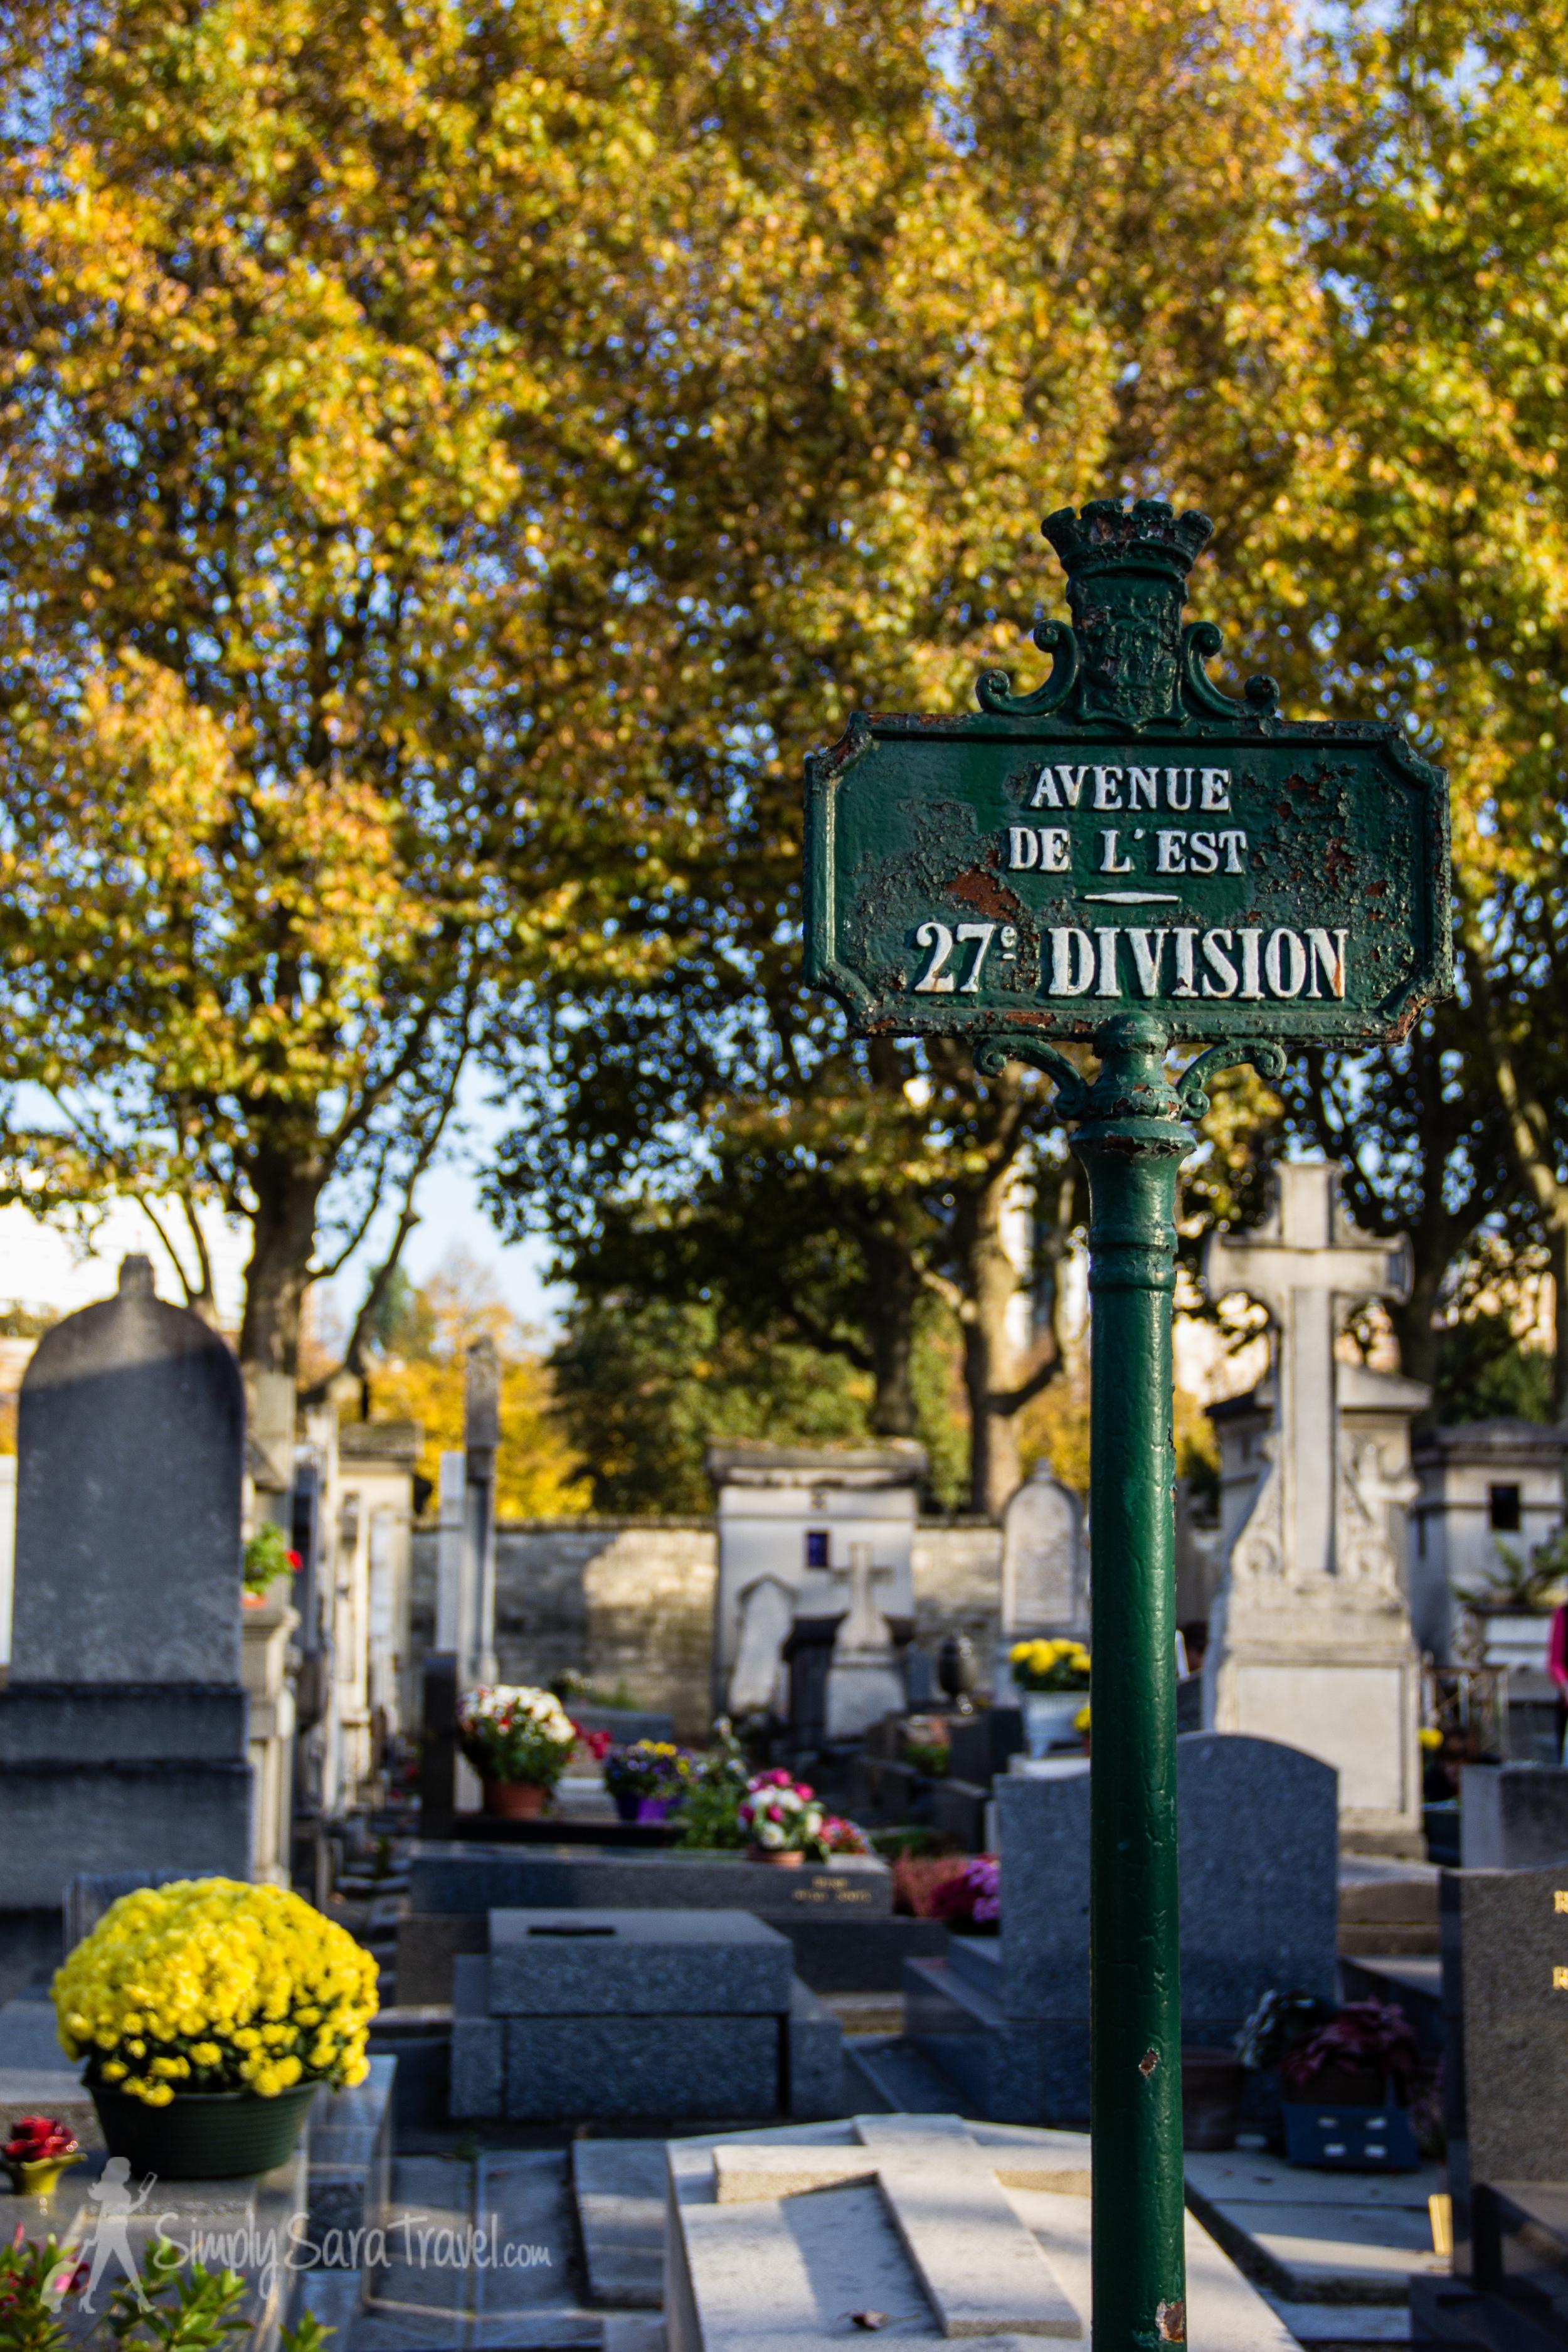 Marker 27th division Cimetière du Montparnasse